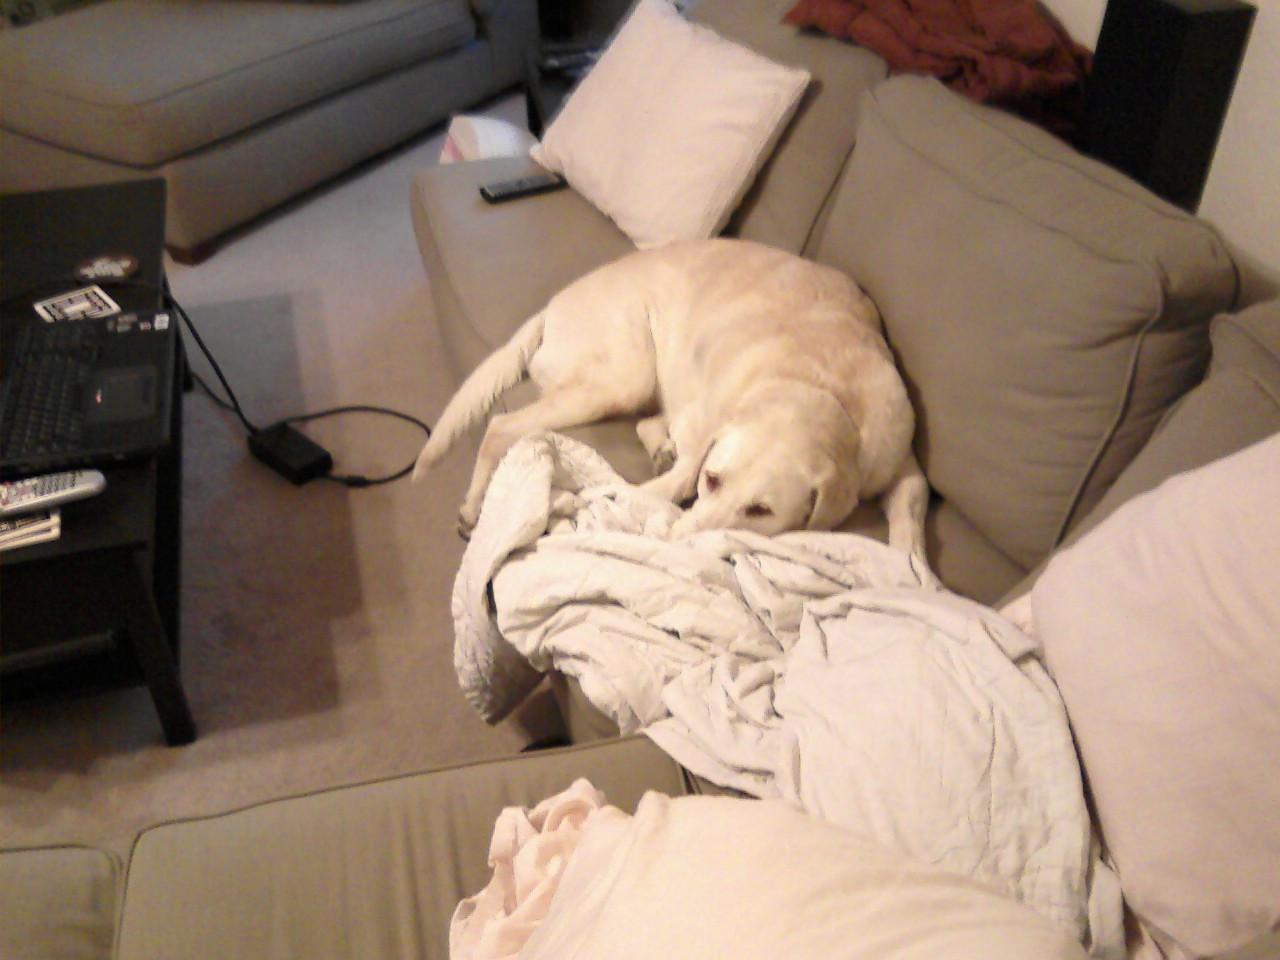 Murphy - couch potato? - November 16, 2007